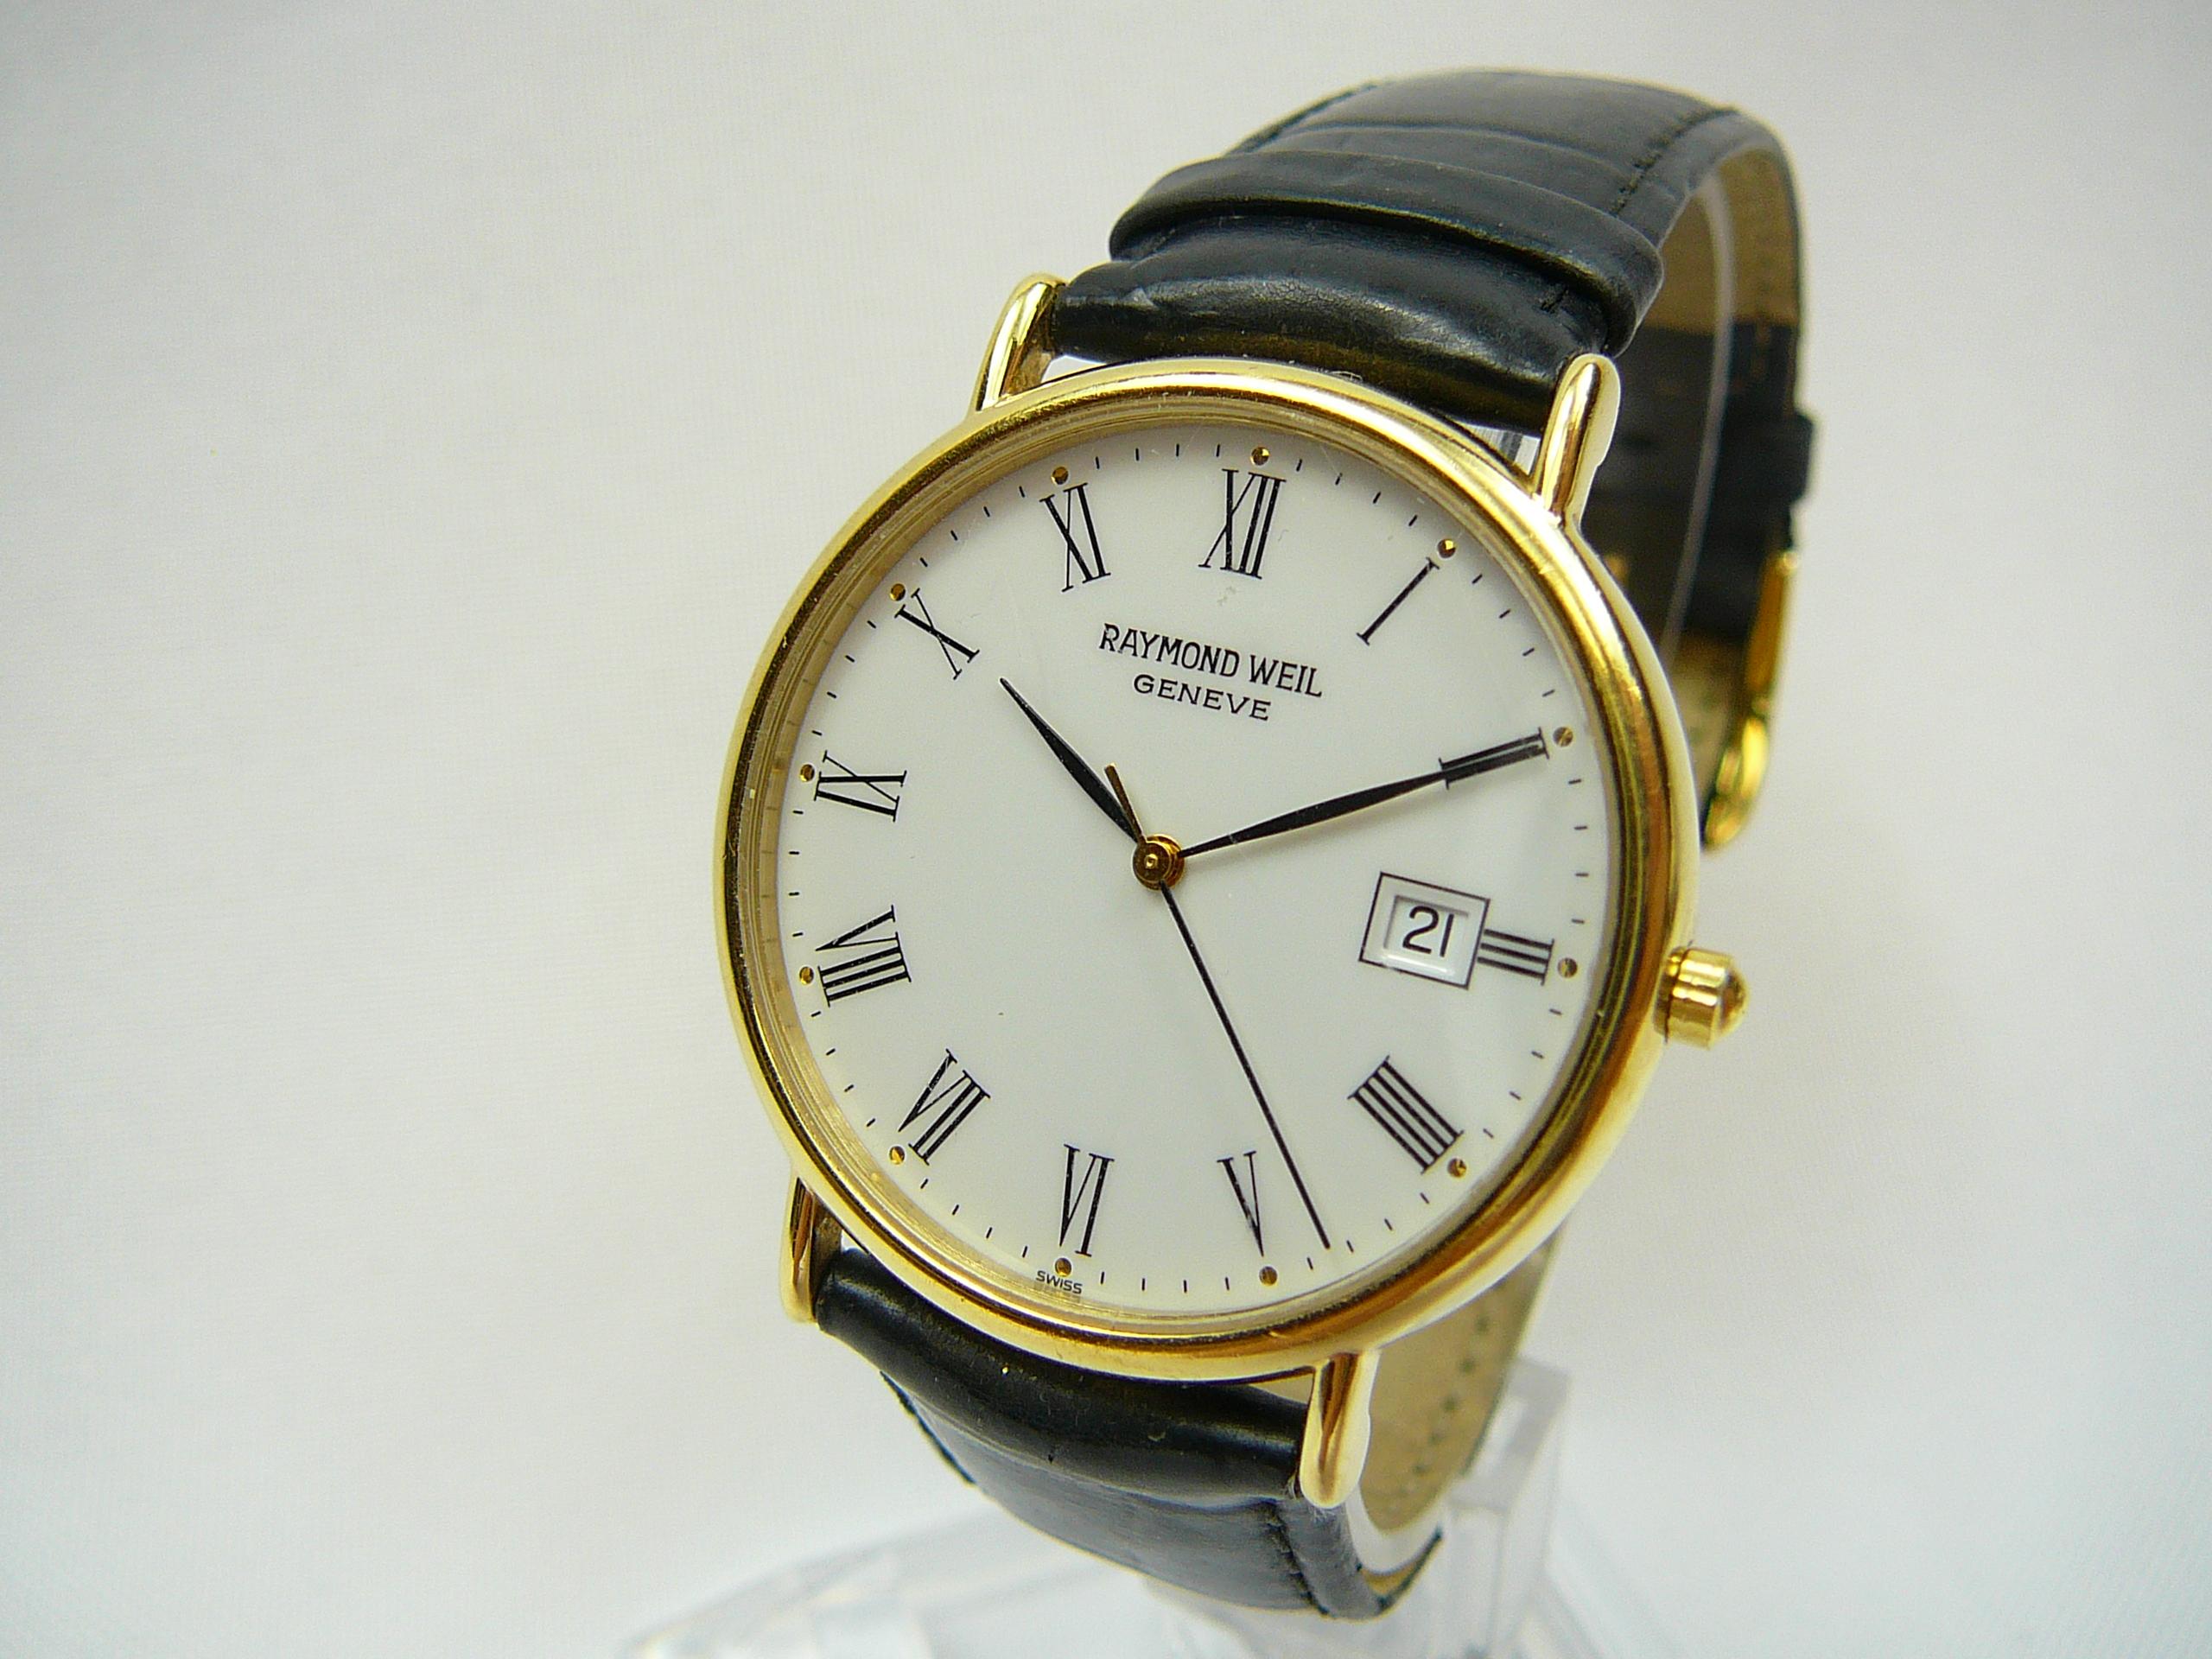 Gents Raymond Weil Wrist Watch - Image 2 of 3